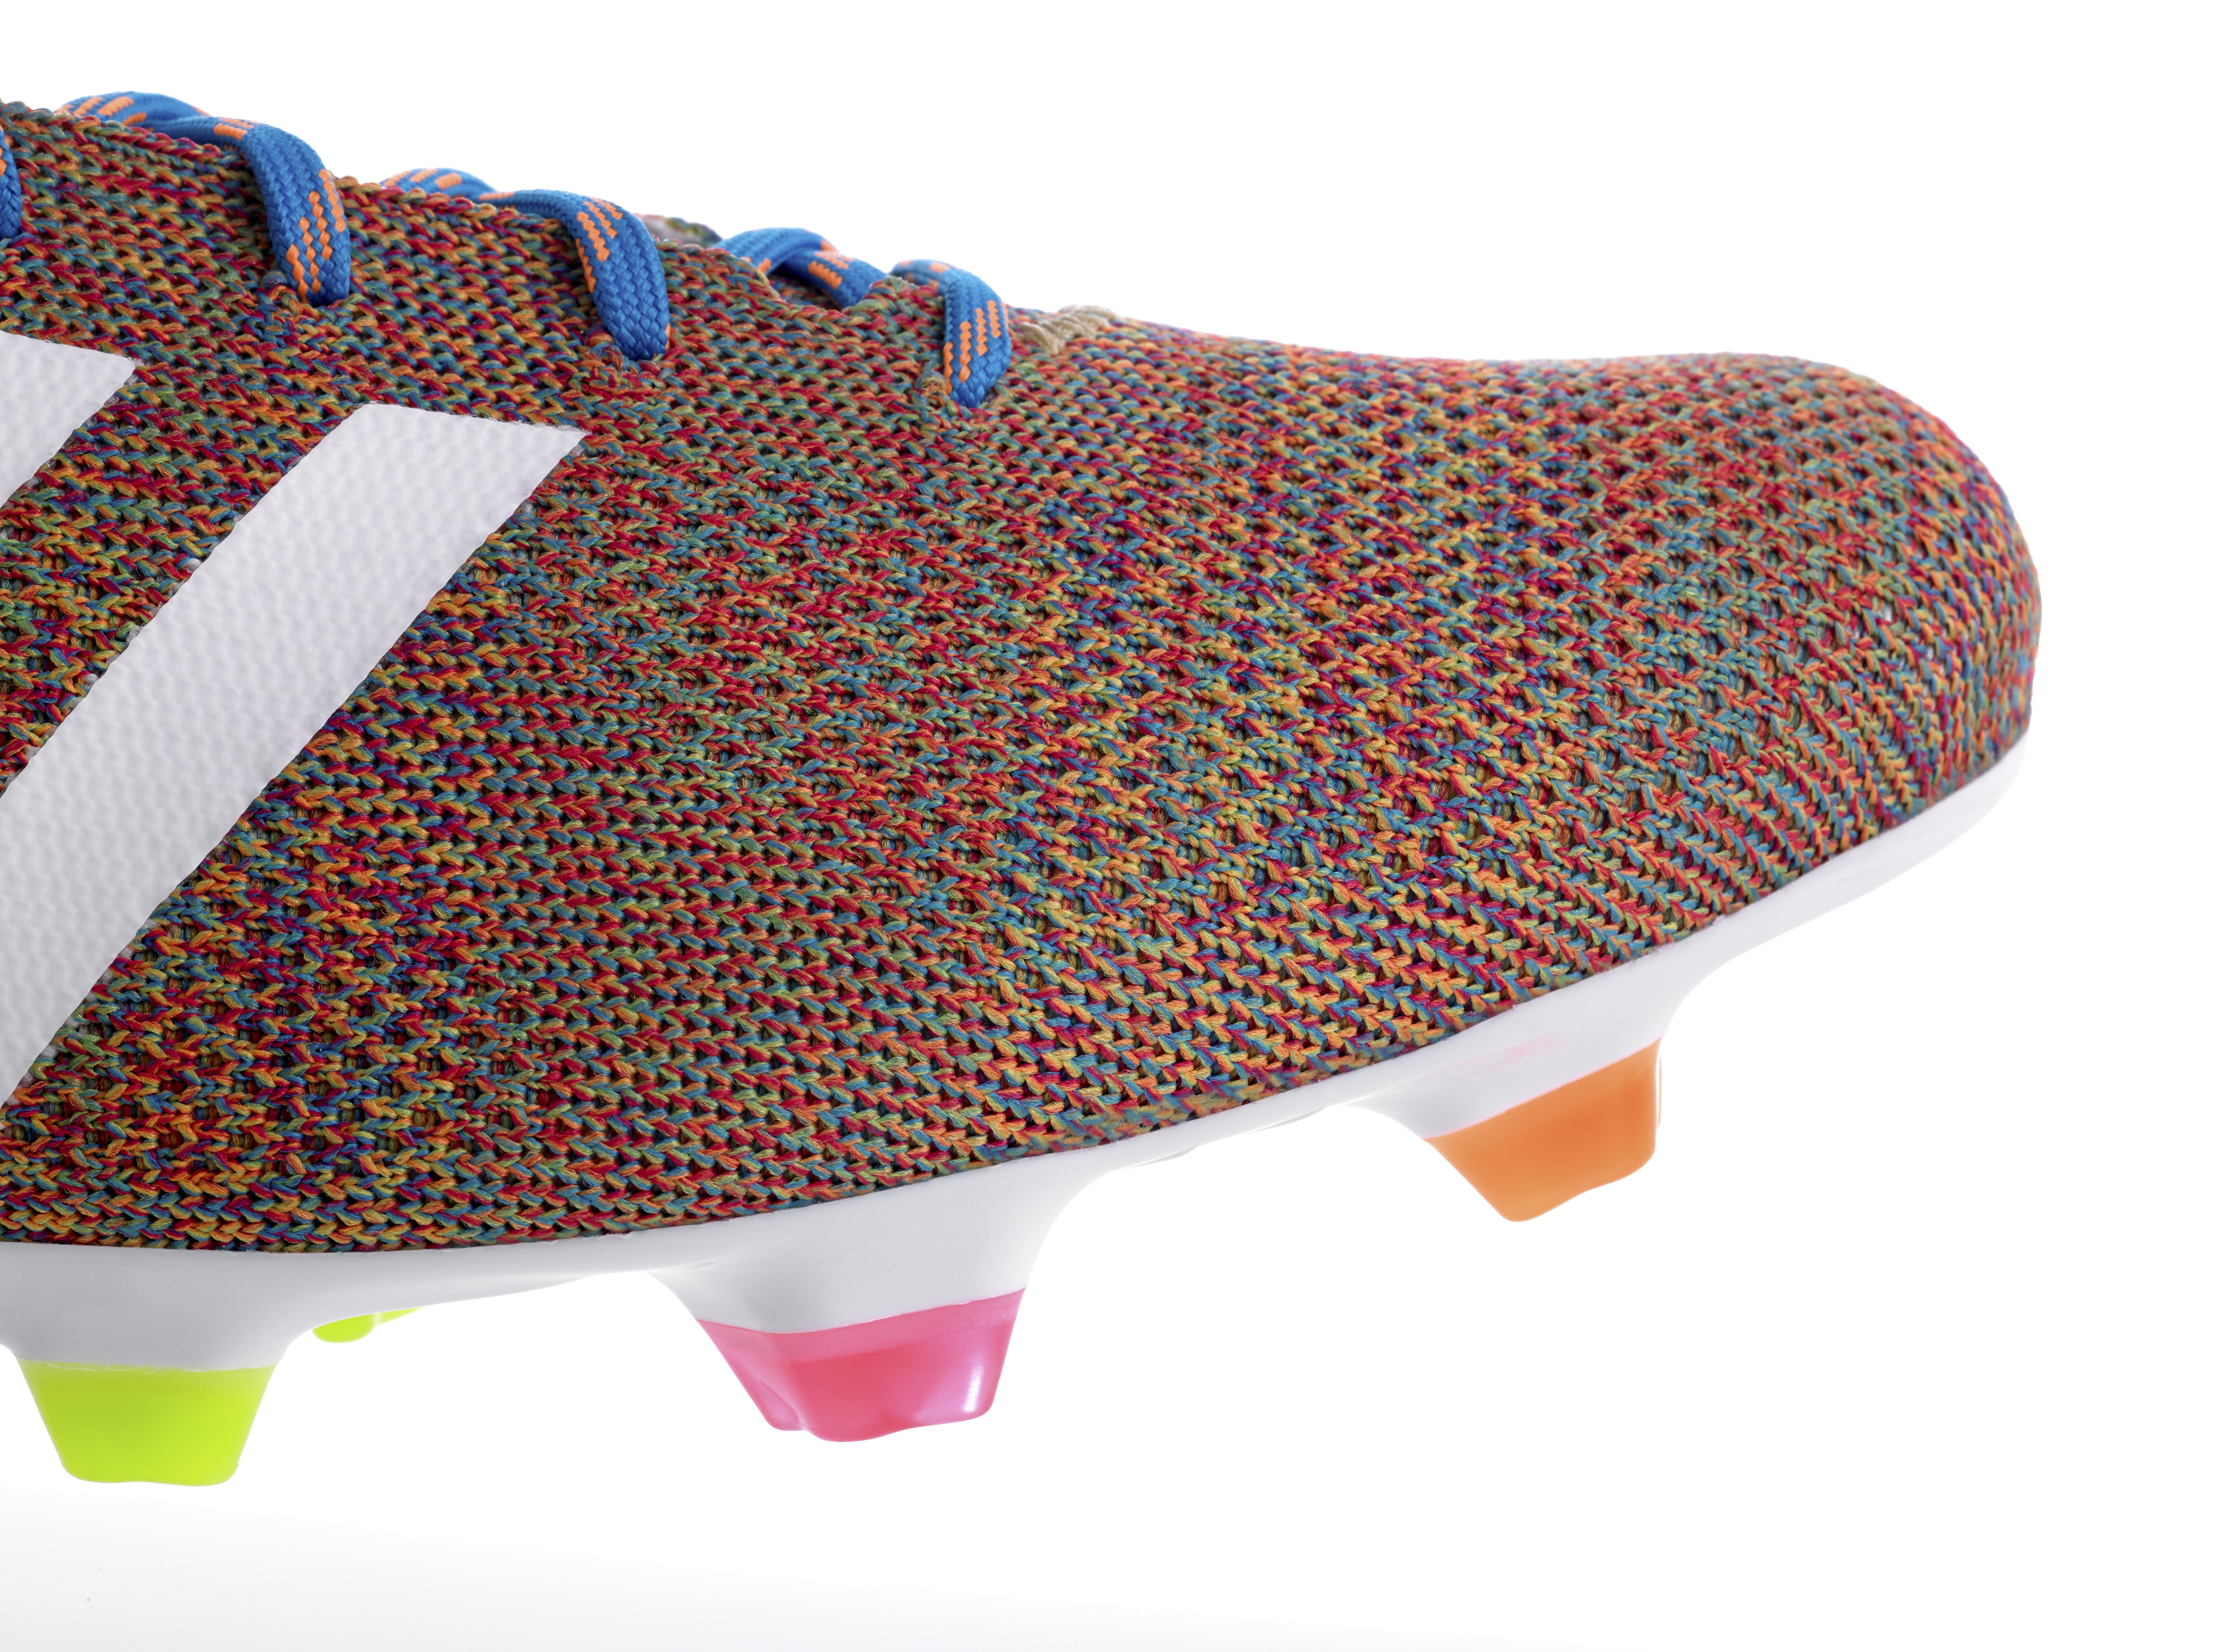 adidas foot